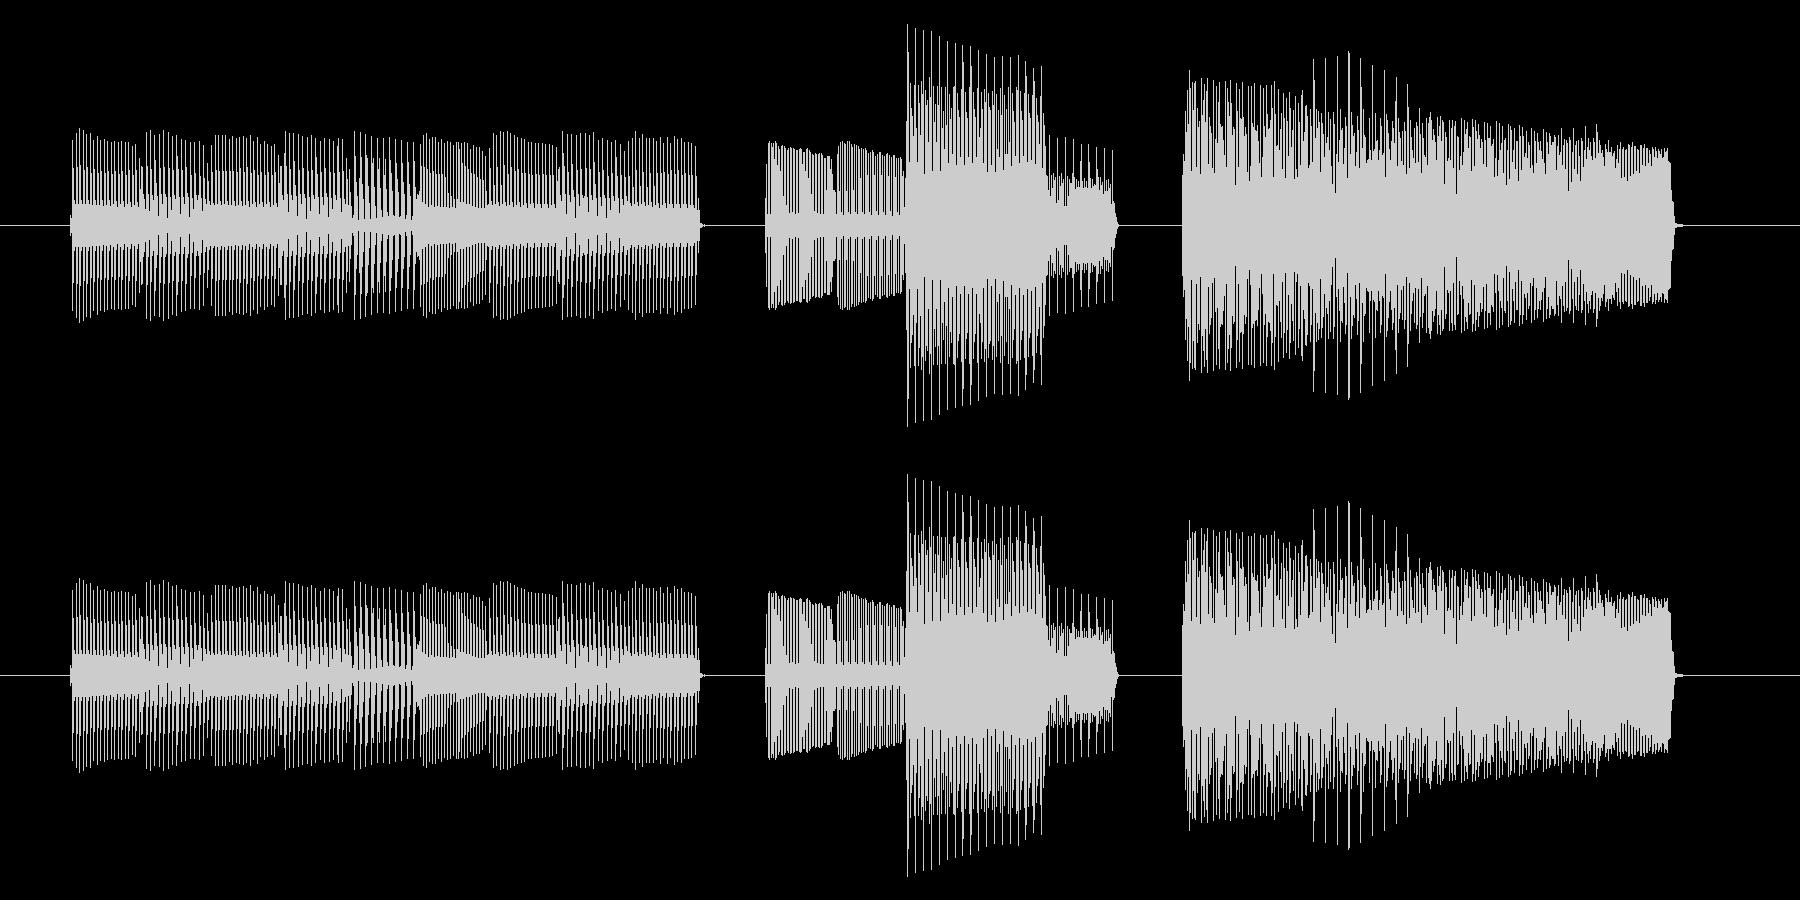 NES 汎用 B03-4(ミス)の未再生の波形